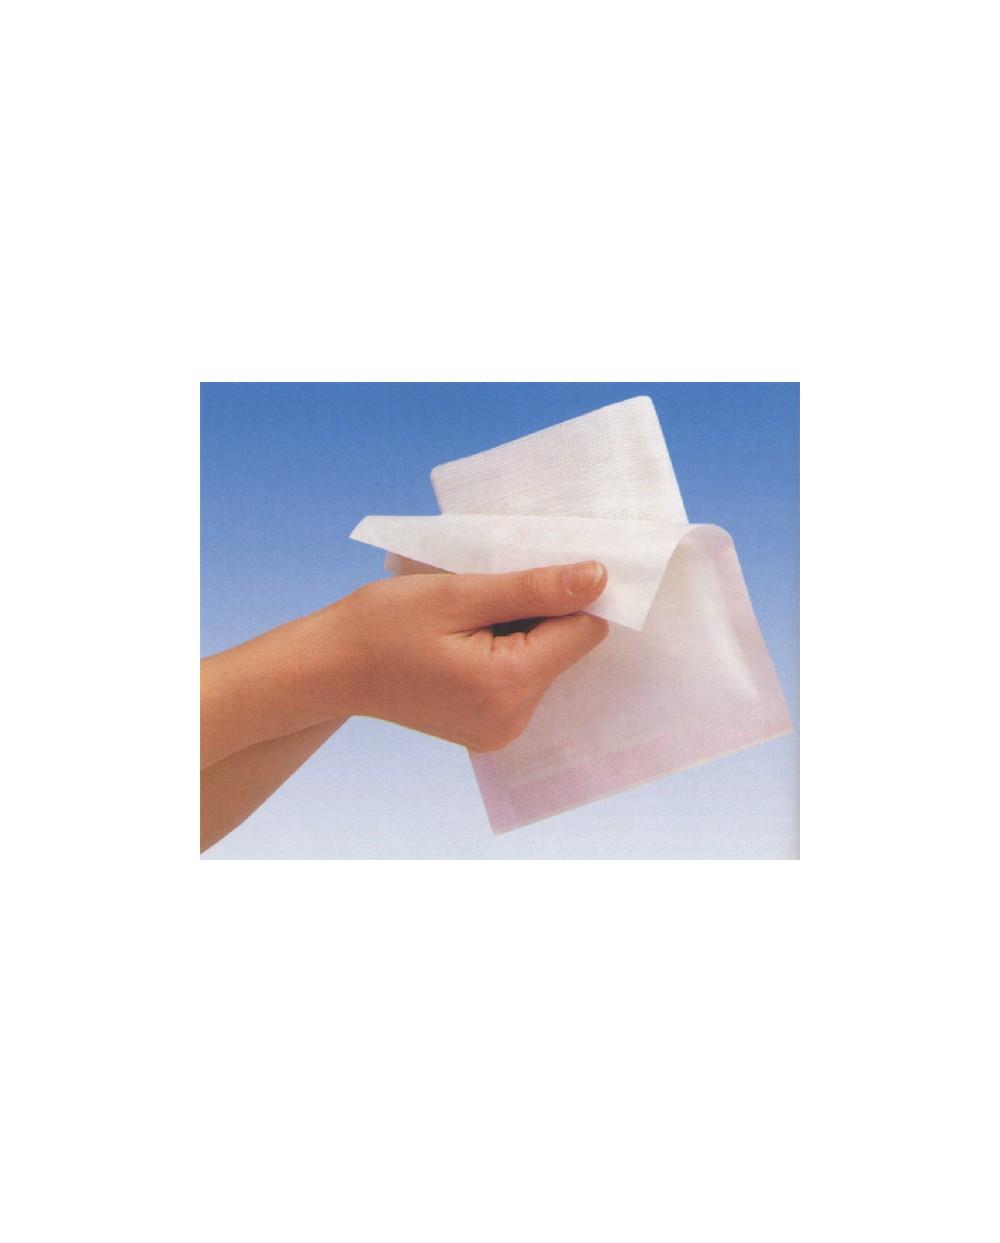 Compresses de gaze Gohy, 7,5 x 7,5 cm, paquet de 50 x 5 compresses